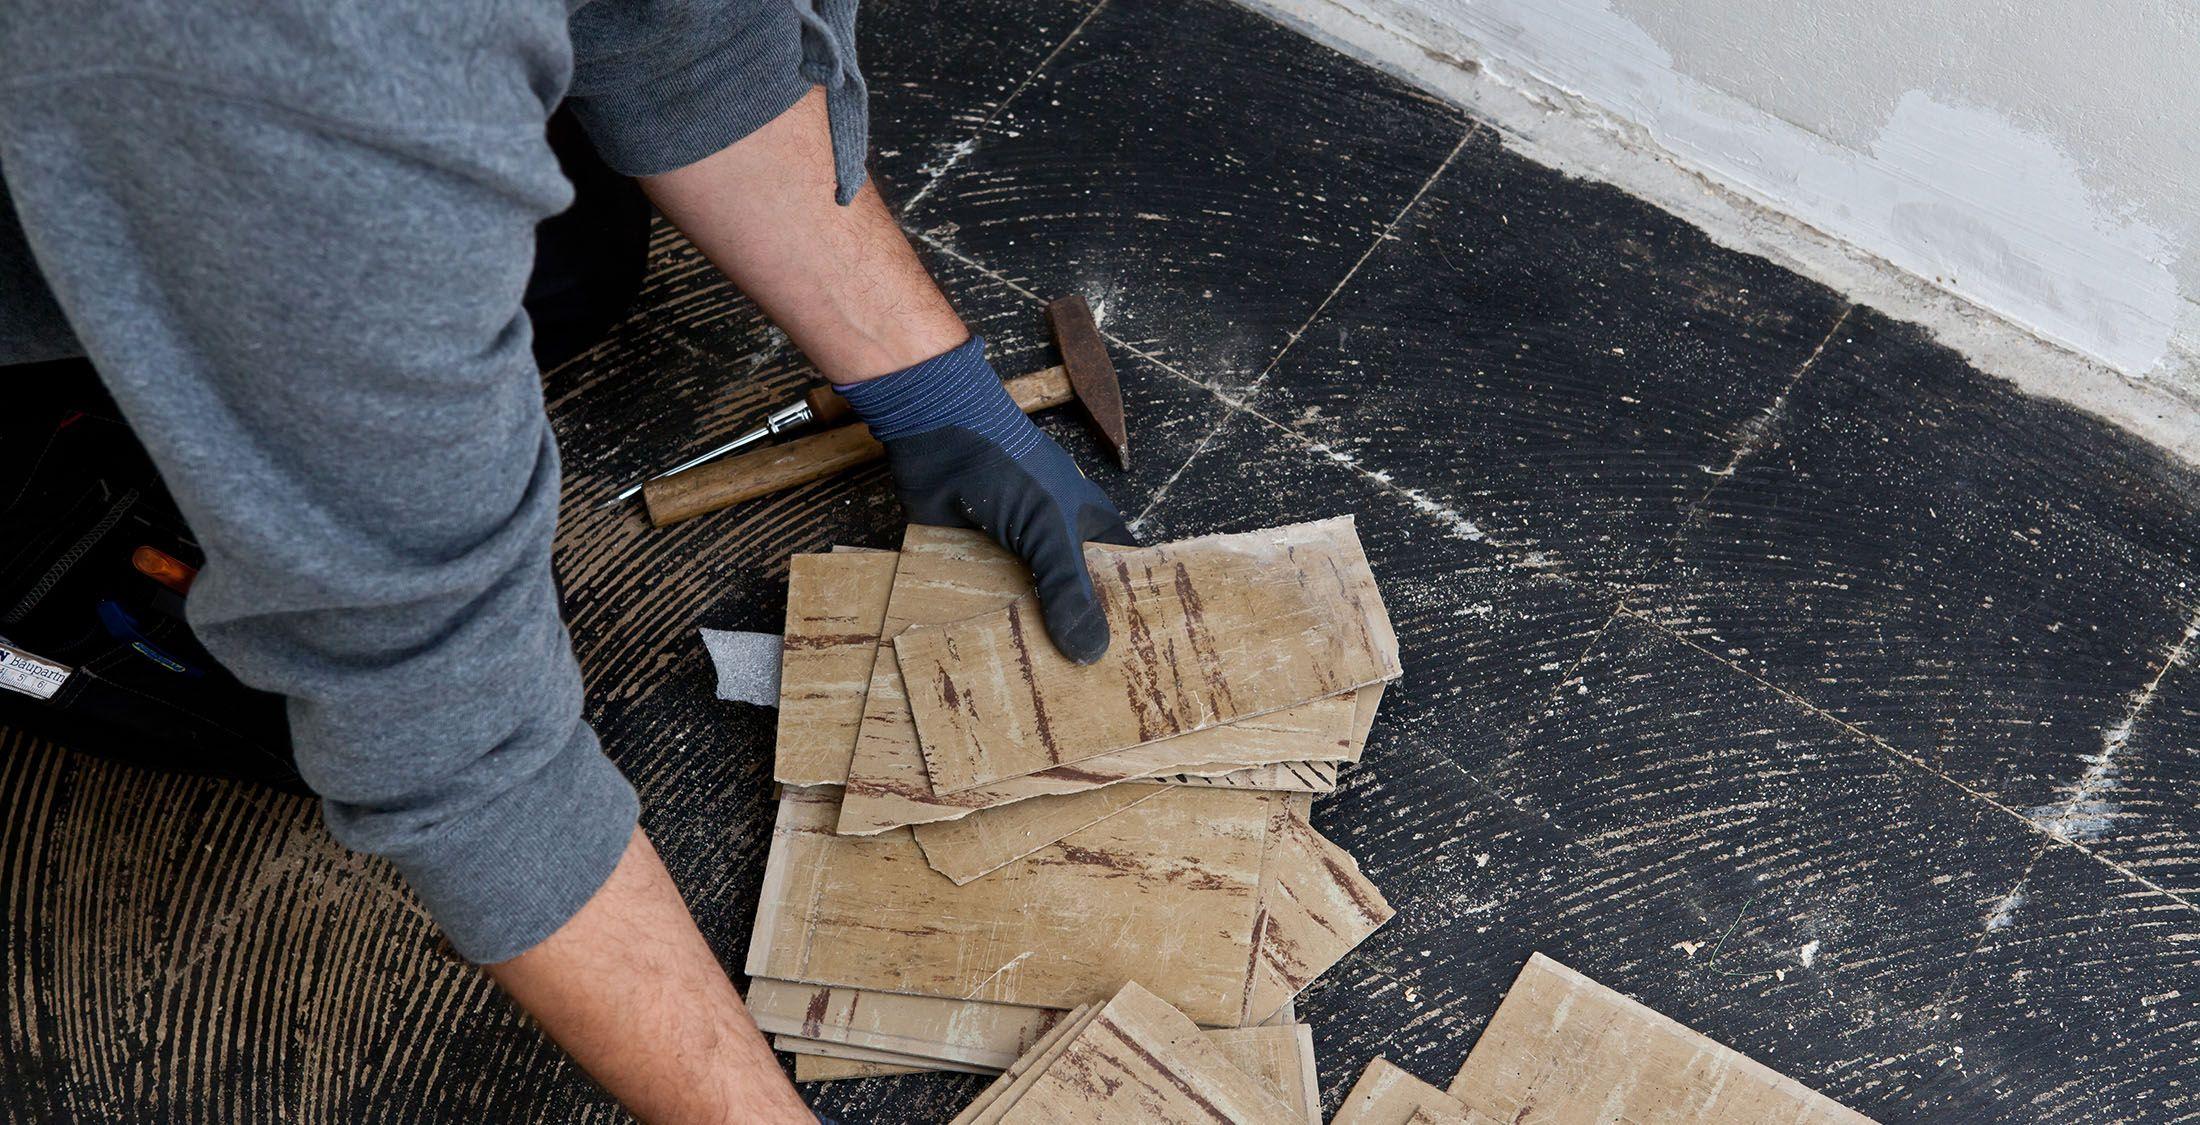 construction worker renovating flooring